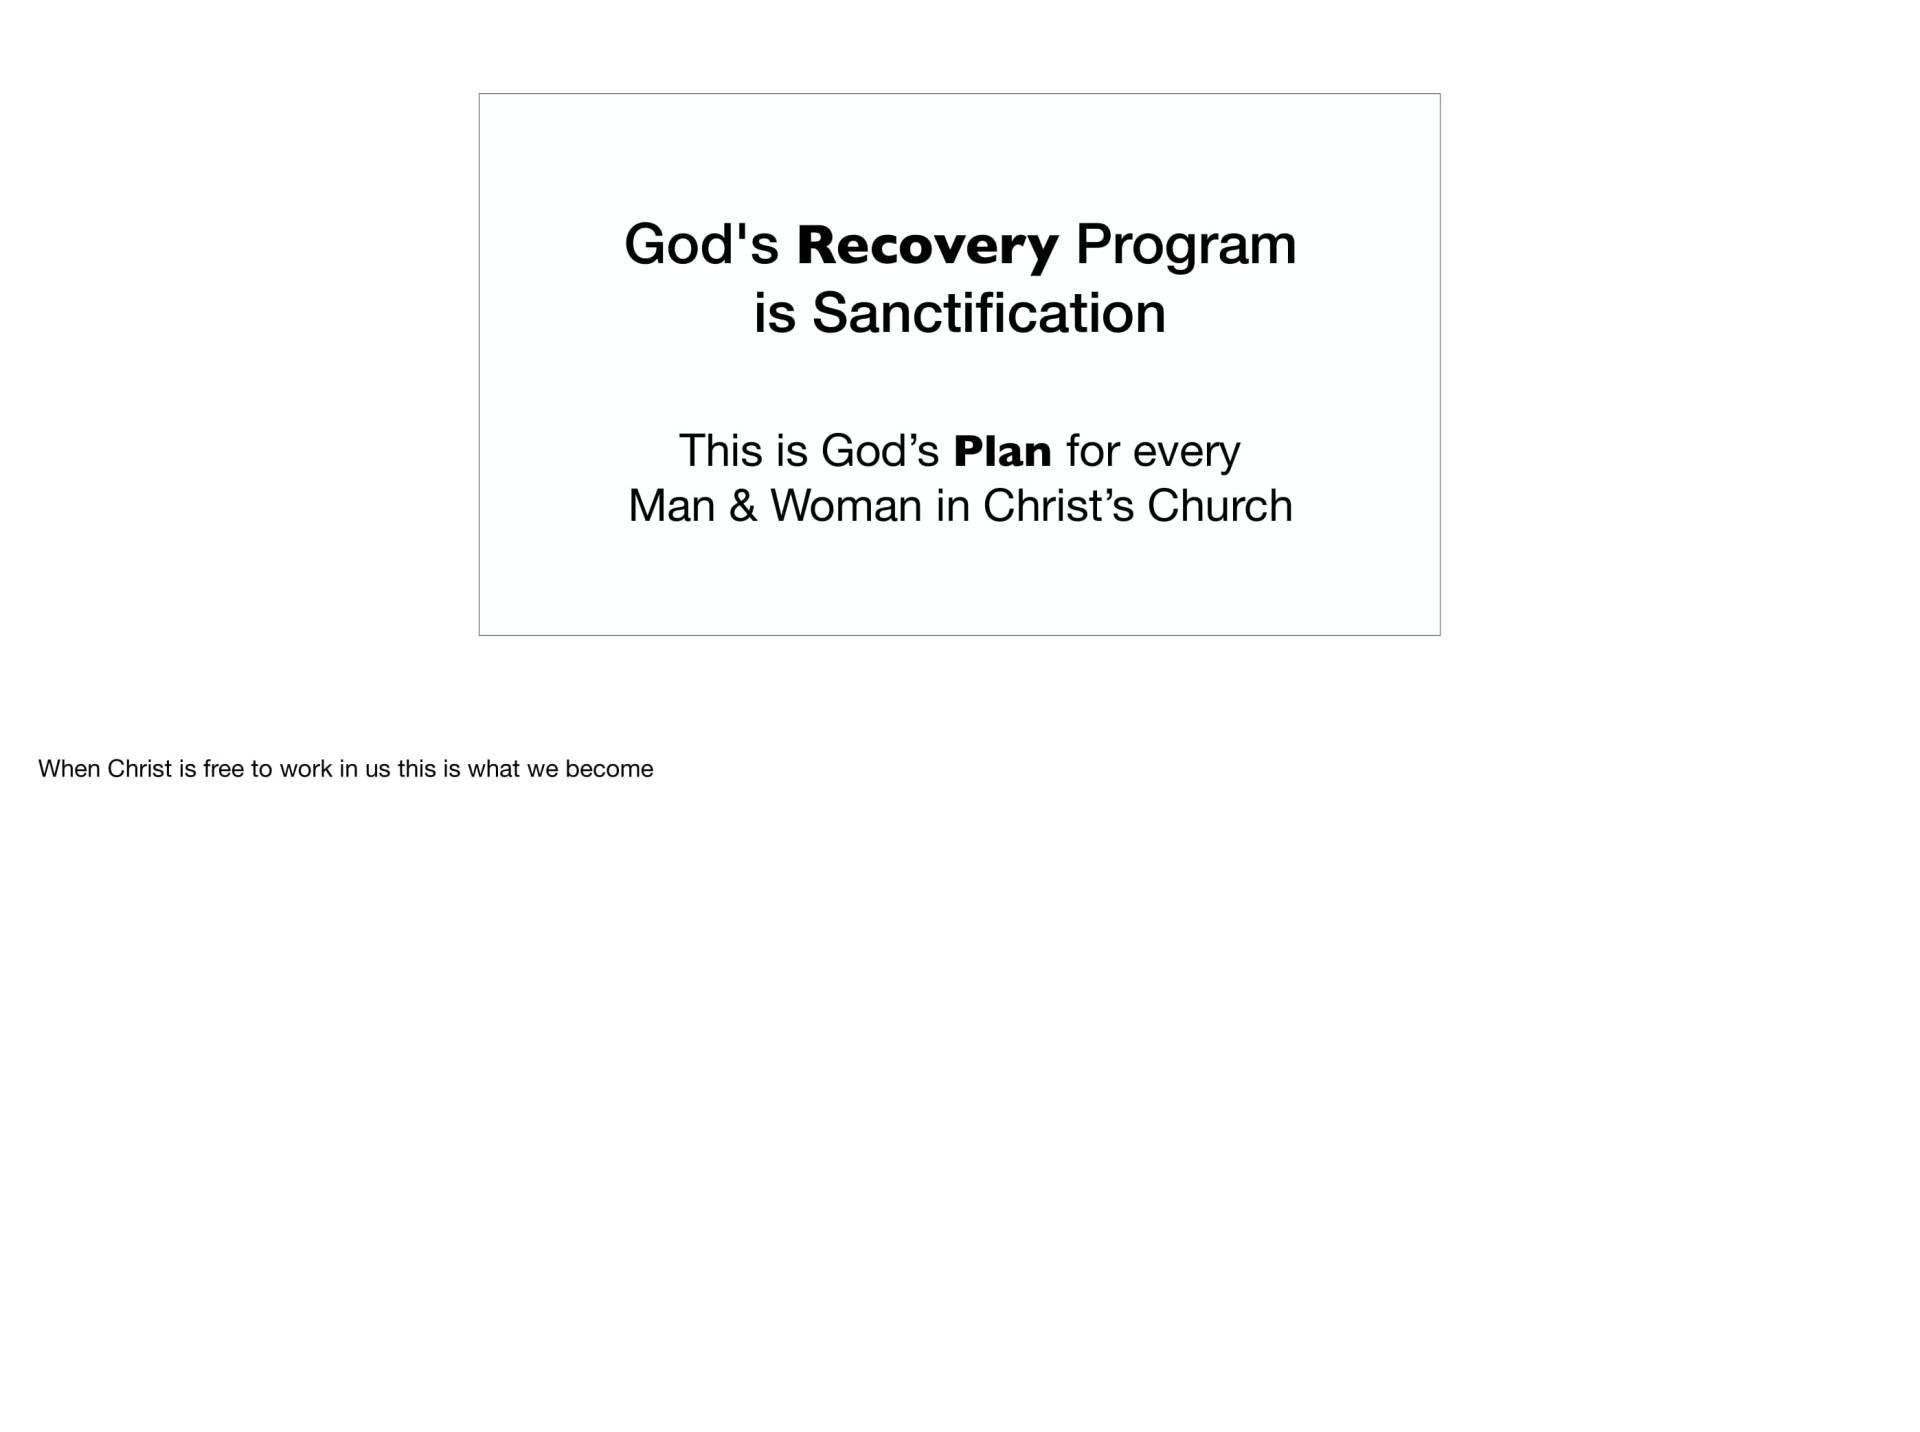 LGI-01 - God's Recovery Program Is Sanctification-23